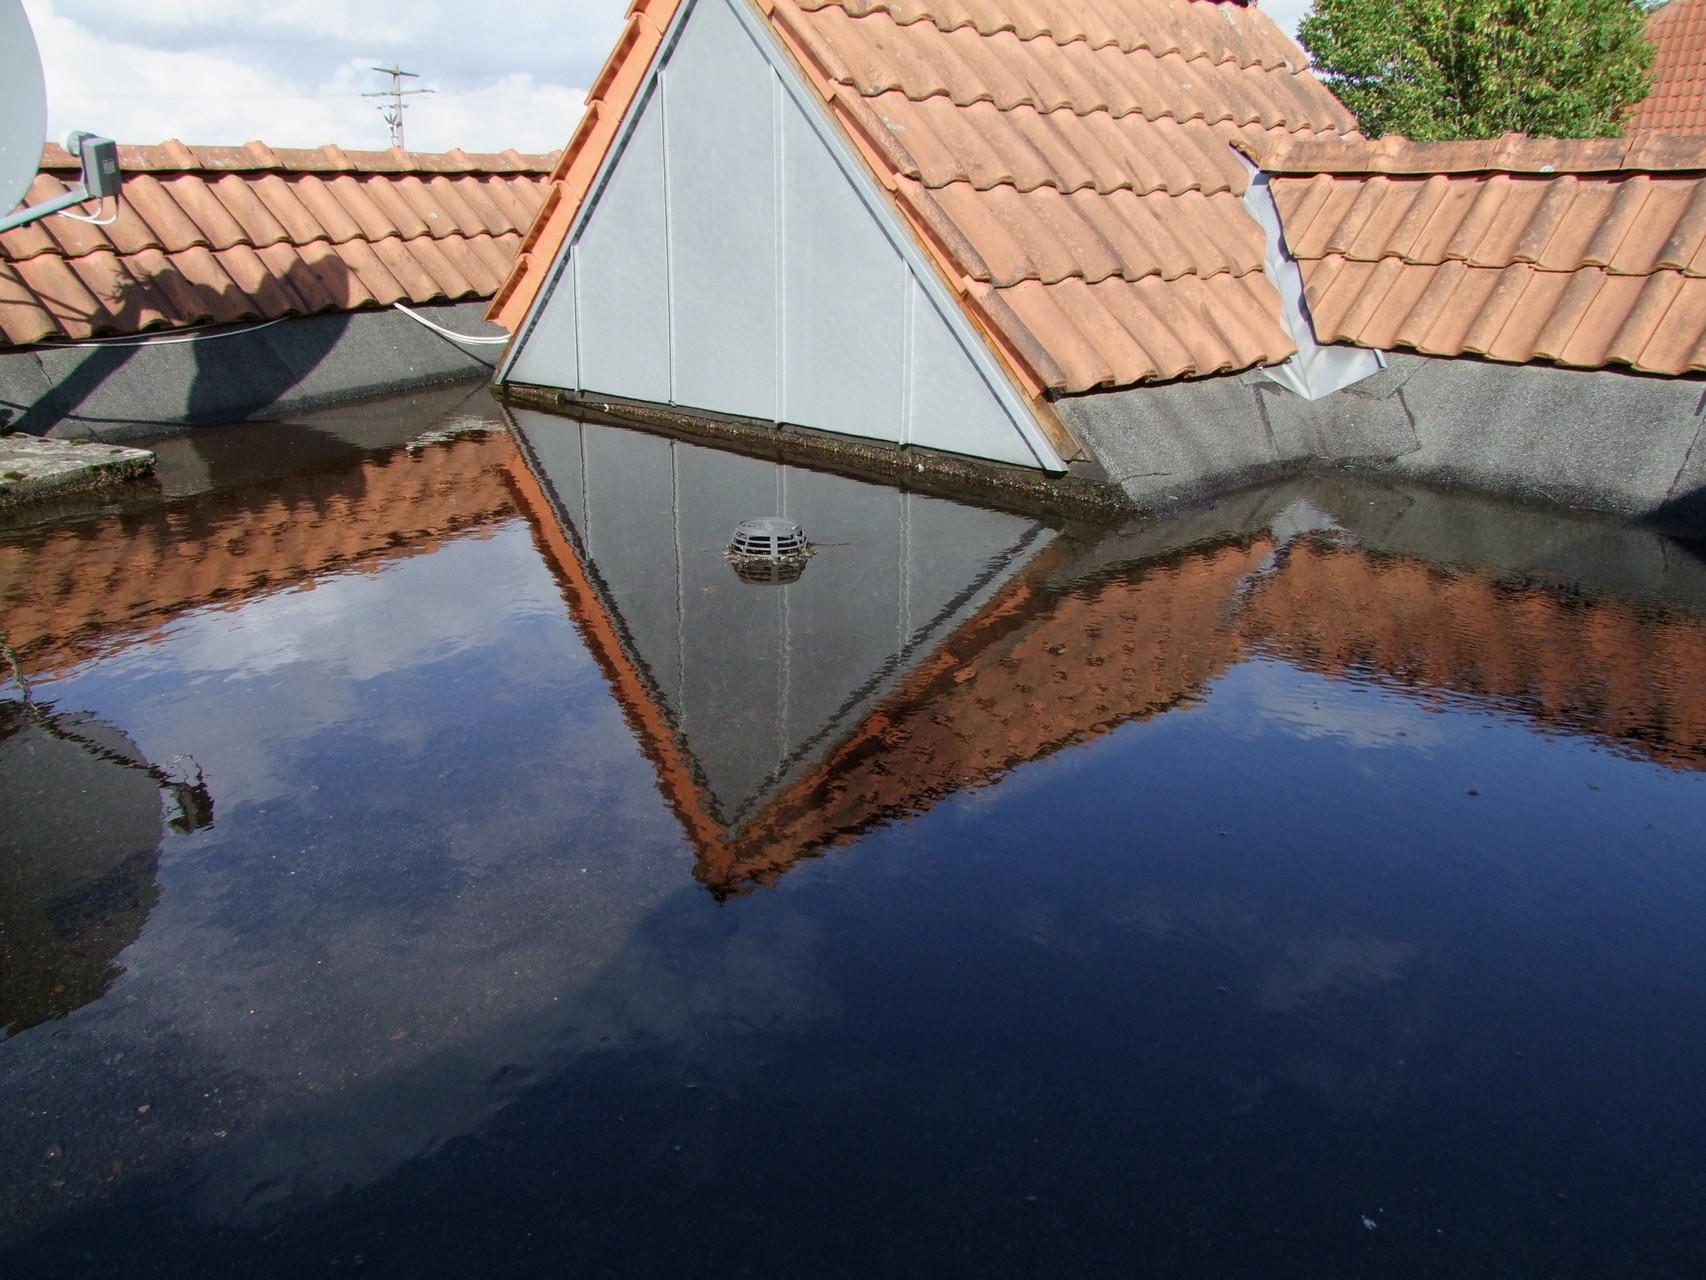 Baugutachten Baugutachter für Adelberg - Göppingen